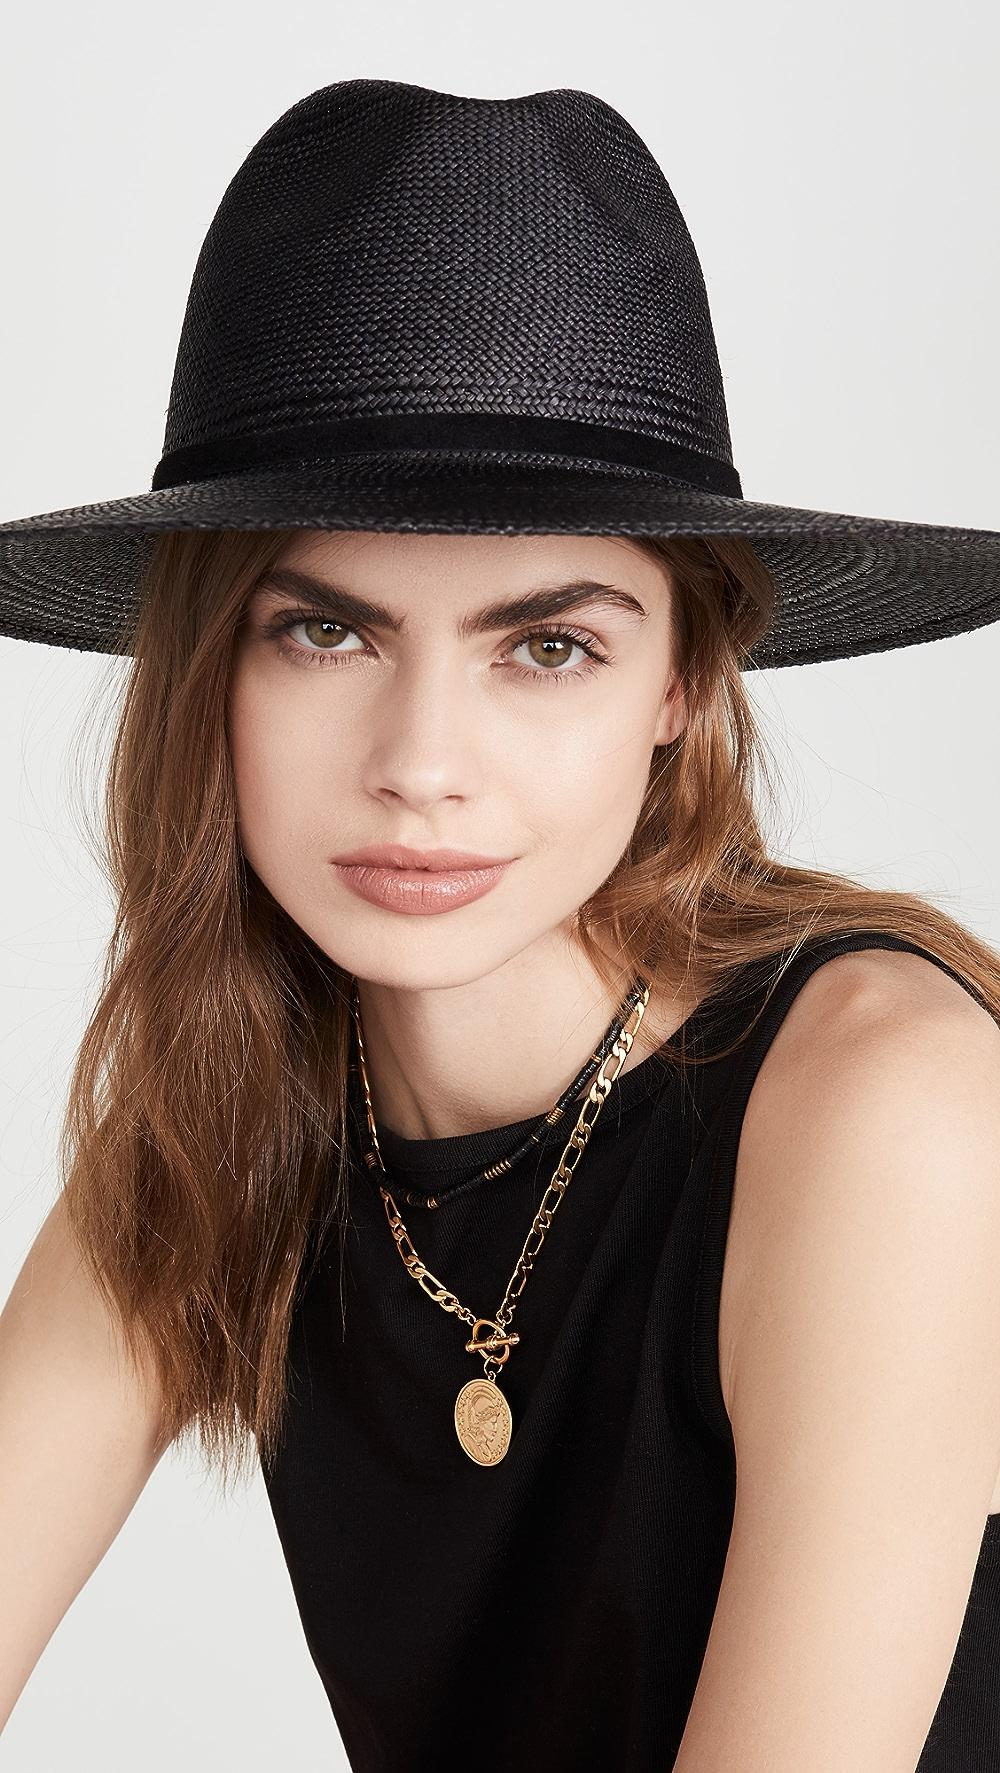 100% True Janessa Leone - Selma Hat Fashionable Patterns